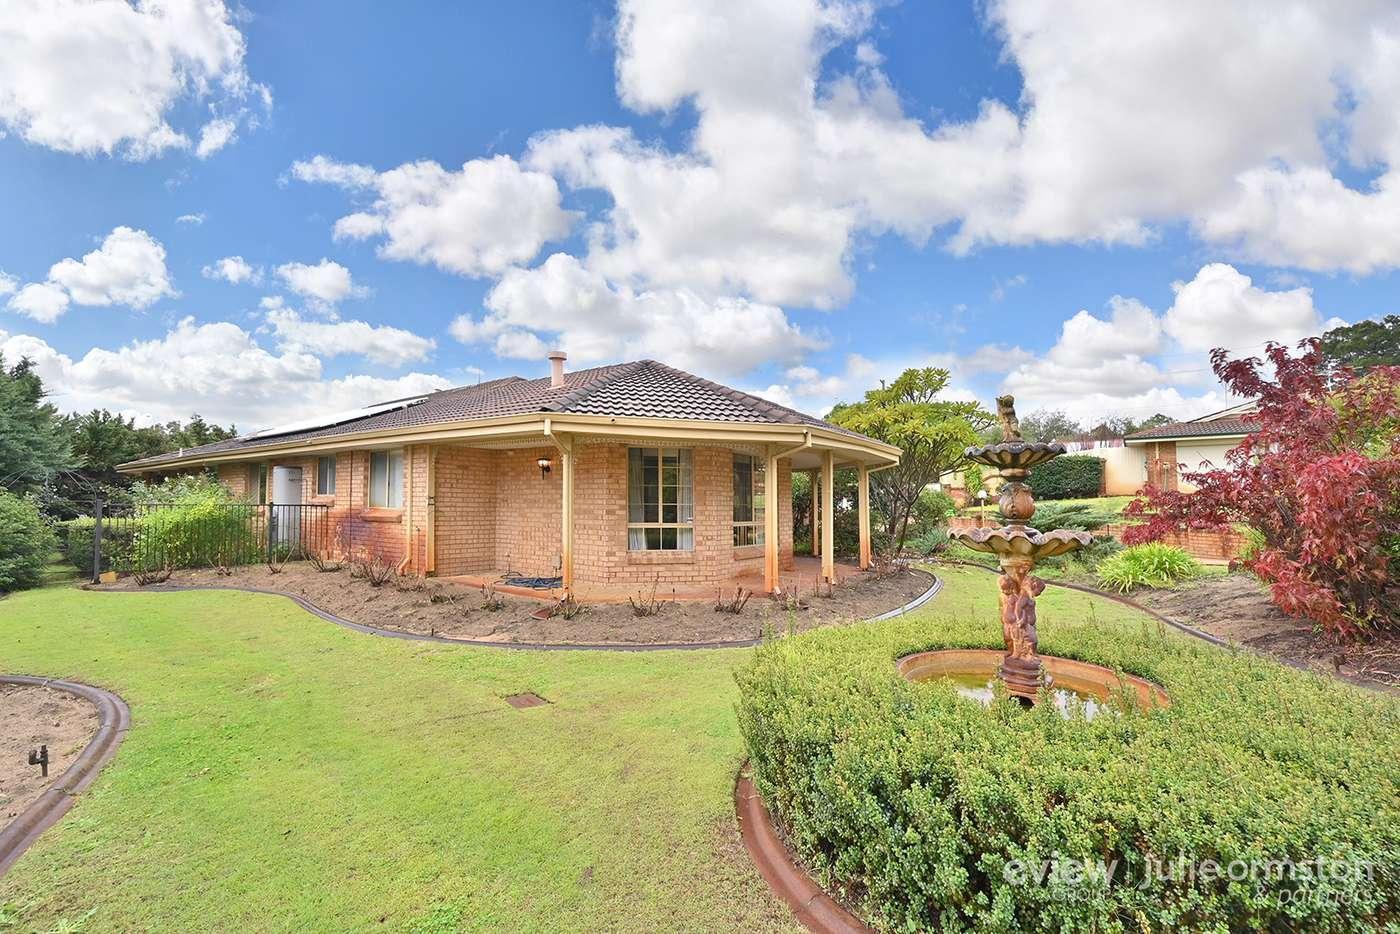 Main view of Homely house listing, 9 Mallard Rise, Kingsley WA 6026